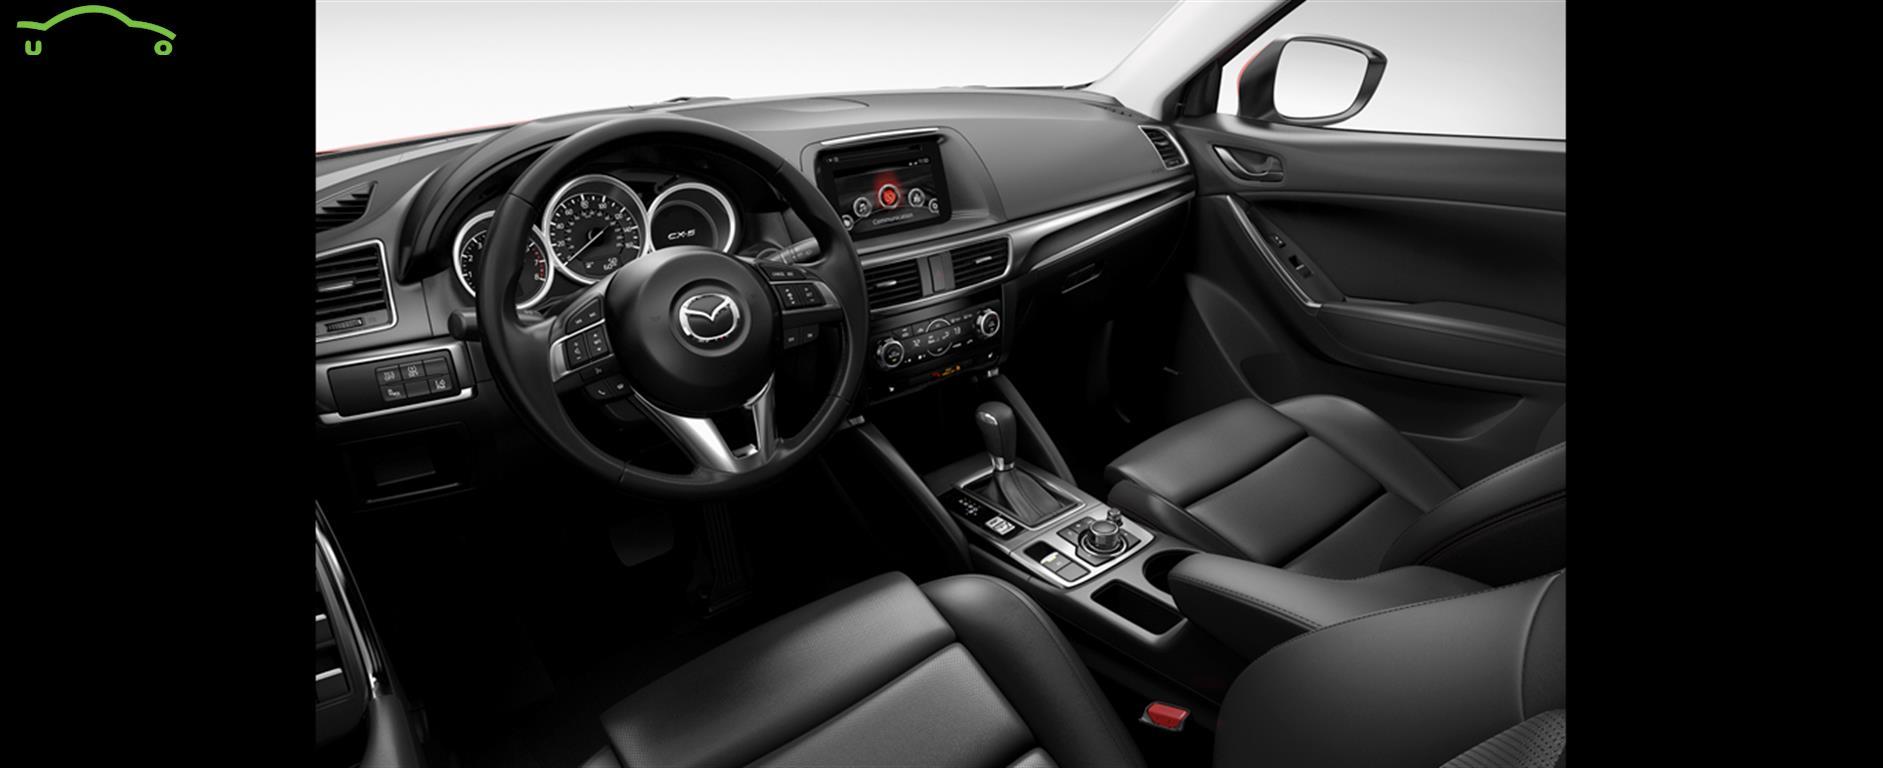 Ban xe Mazda CX-5